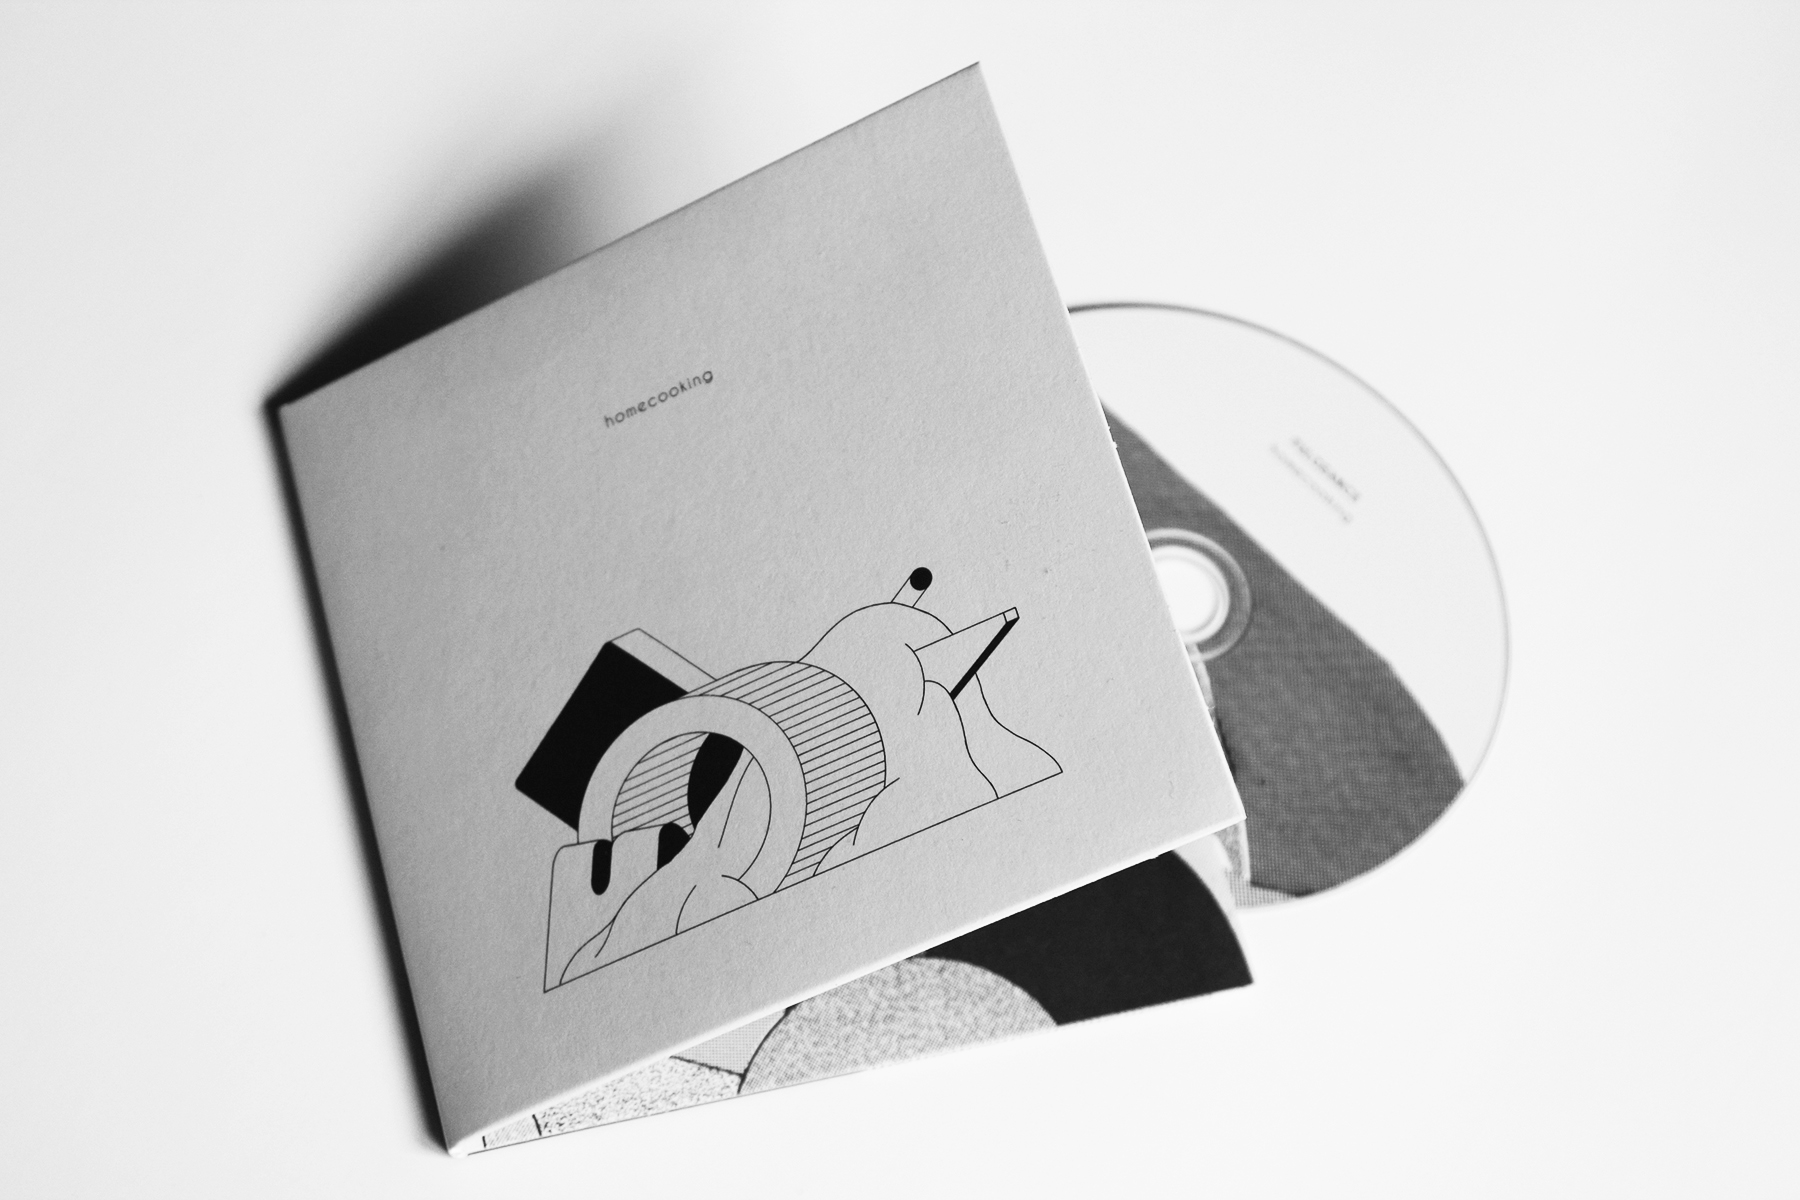 Fulgeance - nouvel album homecooking - electro, electronic music, beats, hip hop, ED Banger box 3